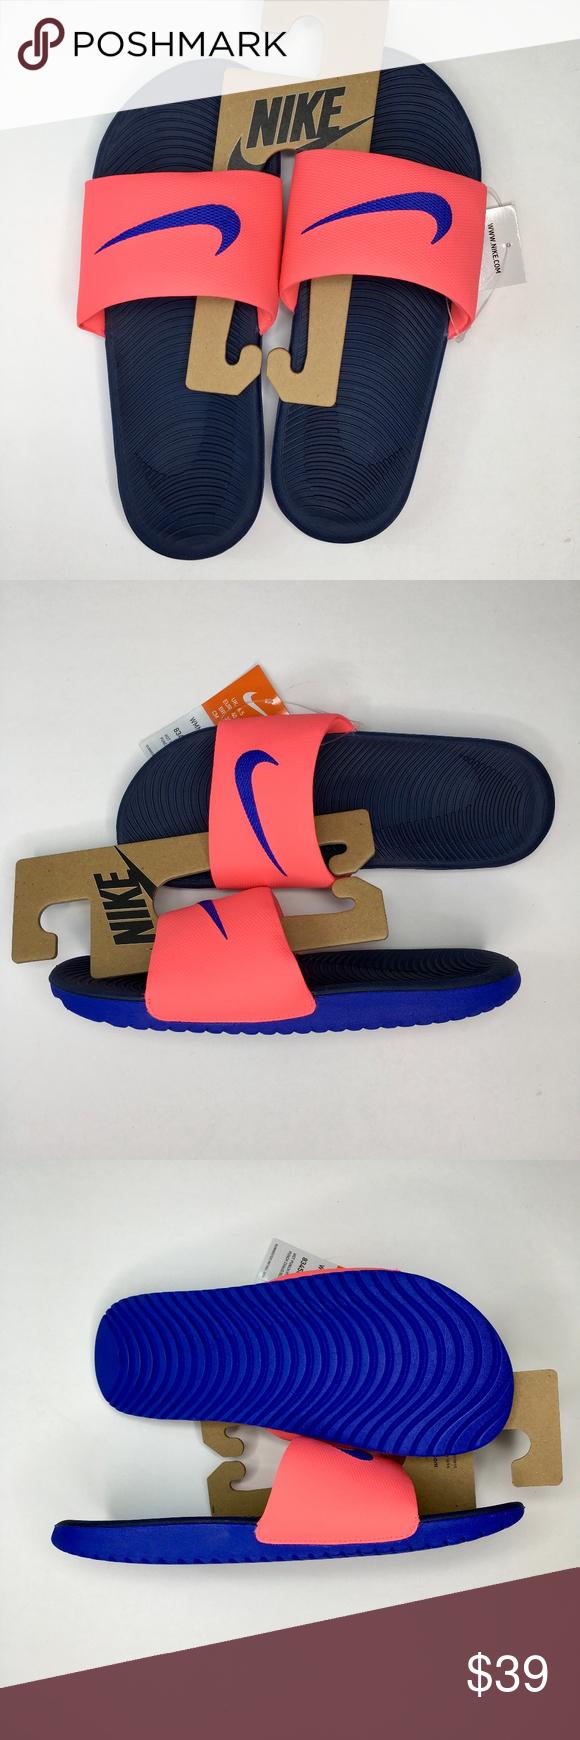 8ff4ee6f869f Nike Hot Punch Paramount Blue Kawa Slide Sandals Nike Women s Hot Punch  Paramount Blue Kawa Slide